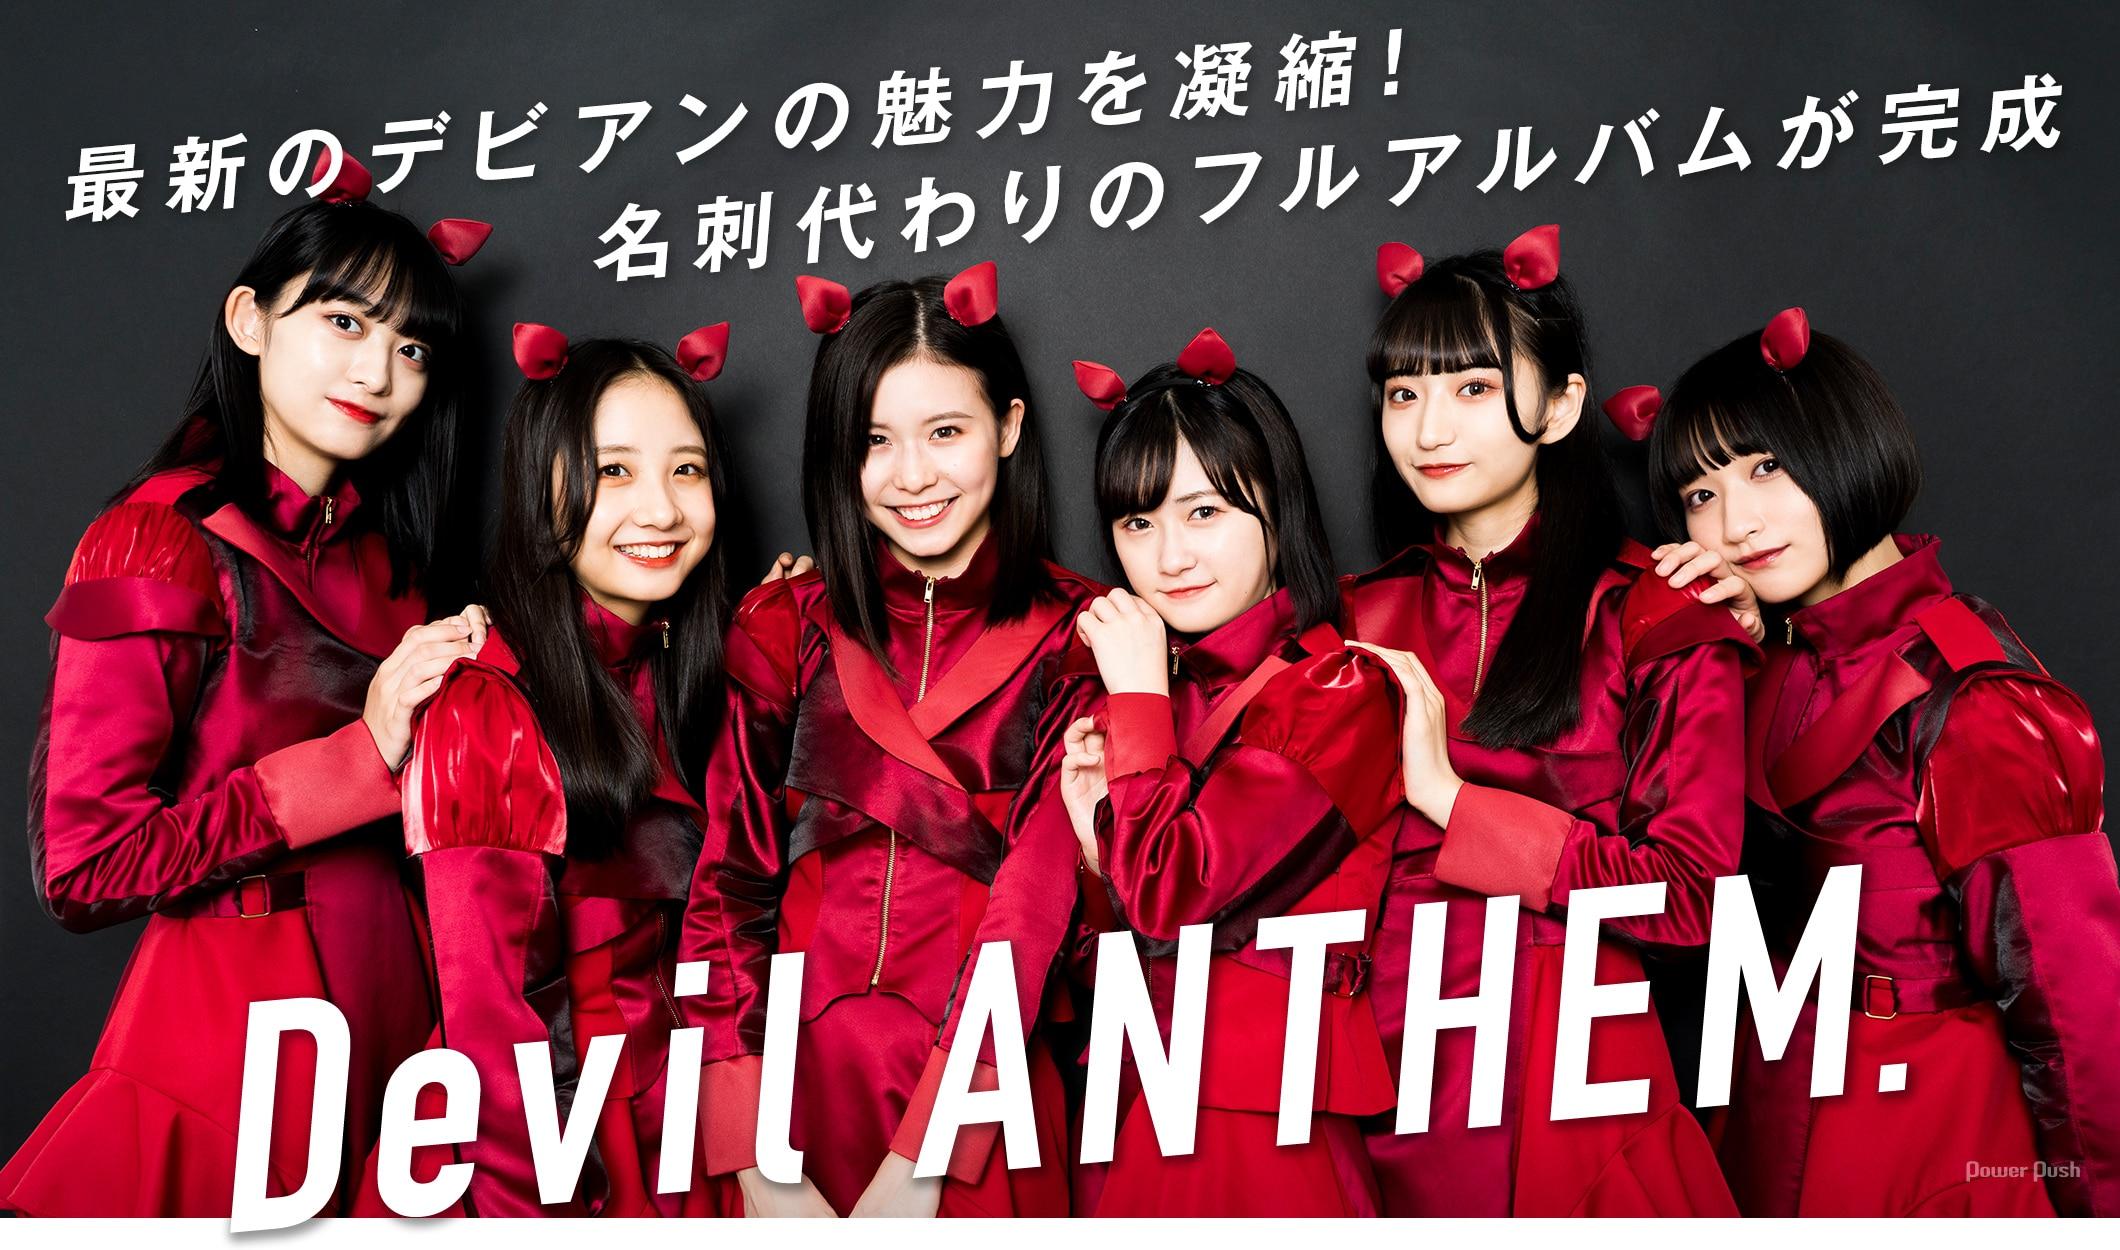 Devil ANTHEM. 最新のデビアンの魅力を凝縮!名刺代わりのフルアルバムが完成